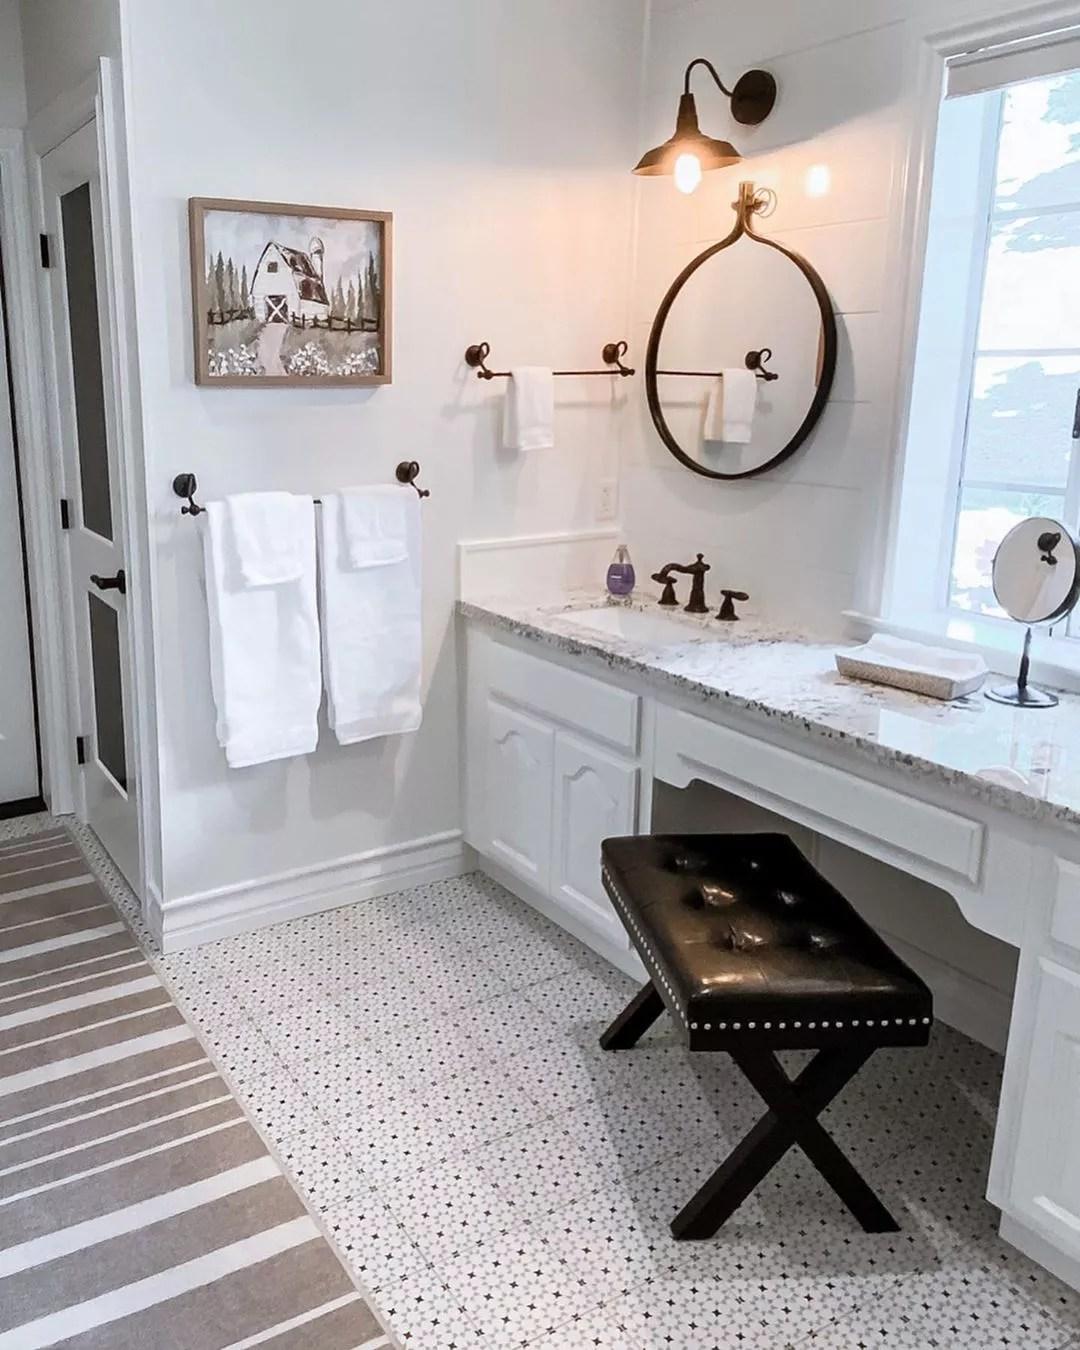 bathroom floor new mosaic tiling under makeup vanity photo by Instagram user @mymodularfarmhouse